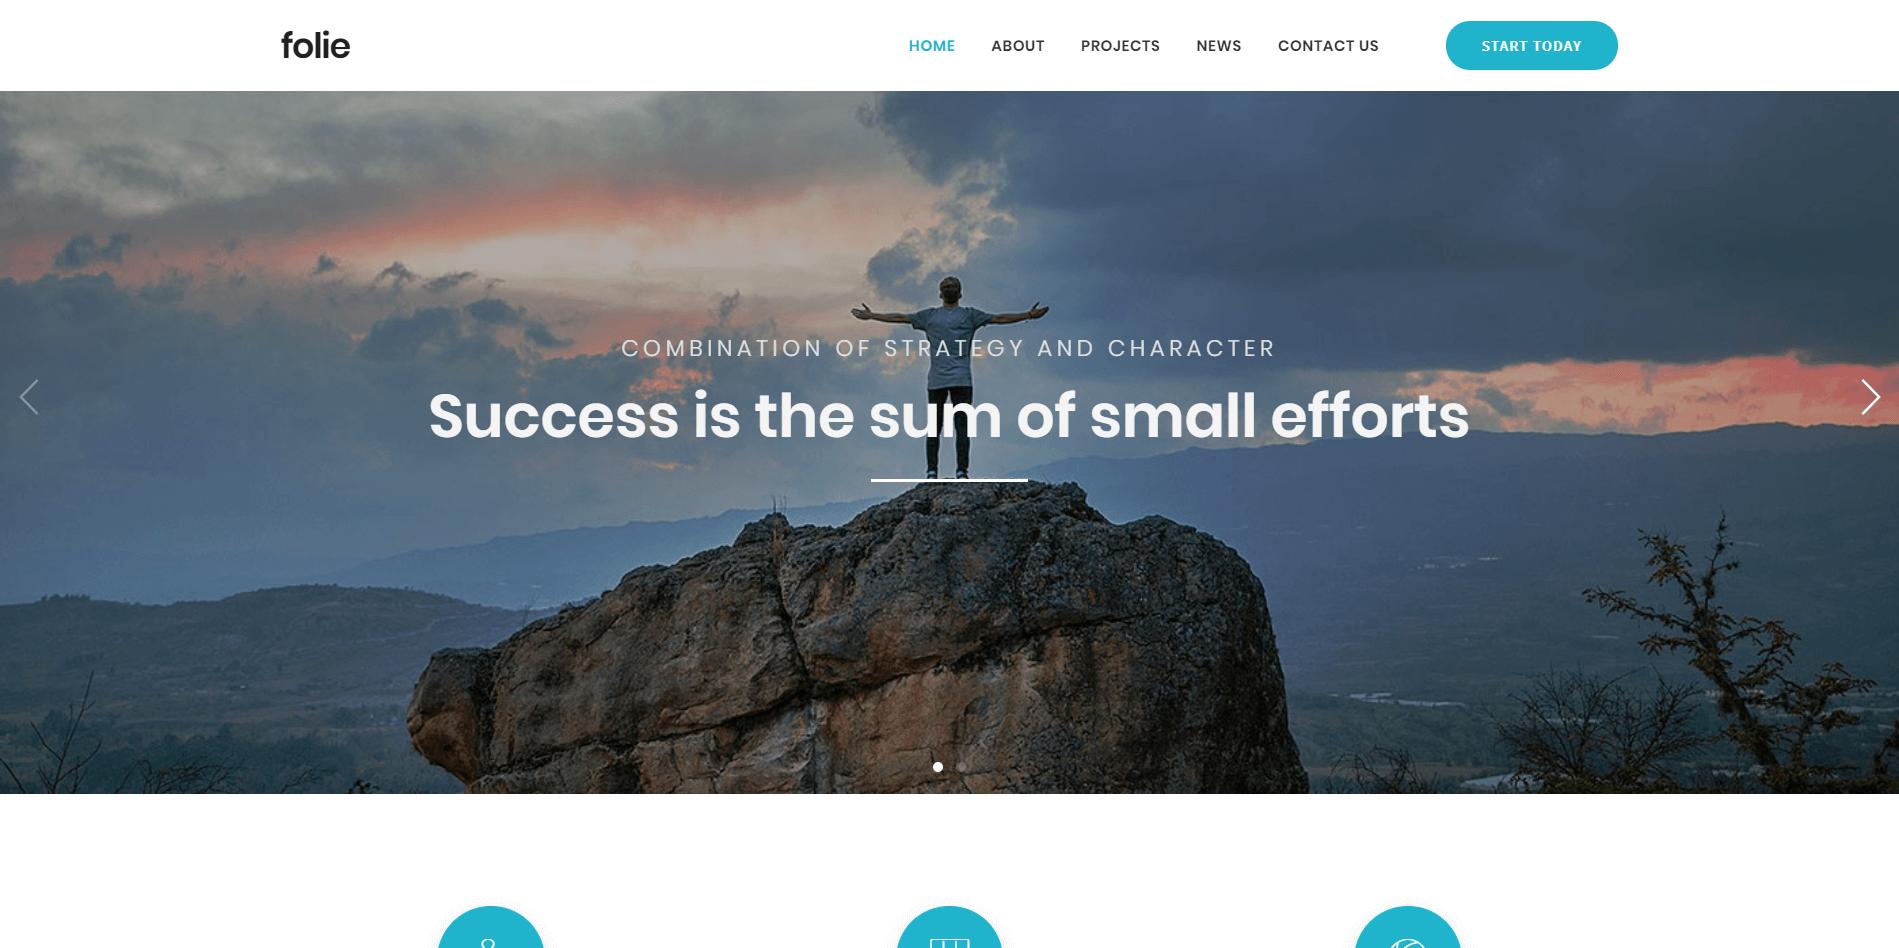 Folie Minimal WordPress Theme